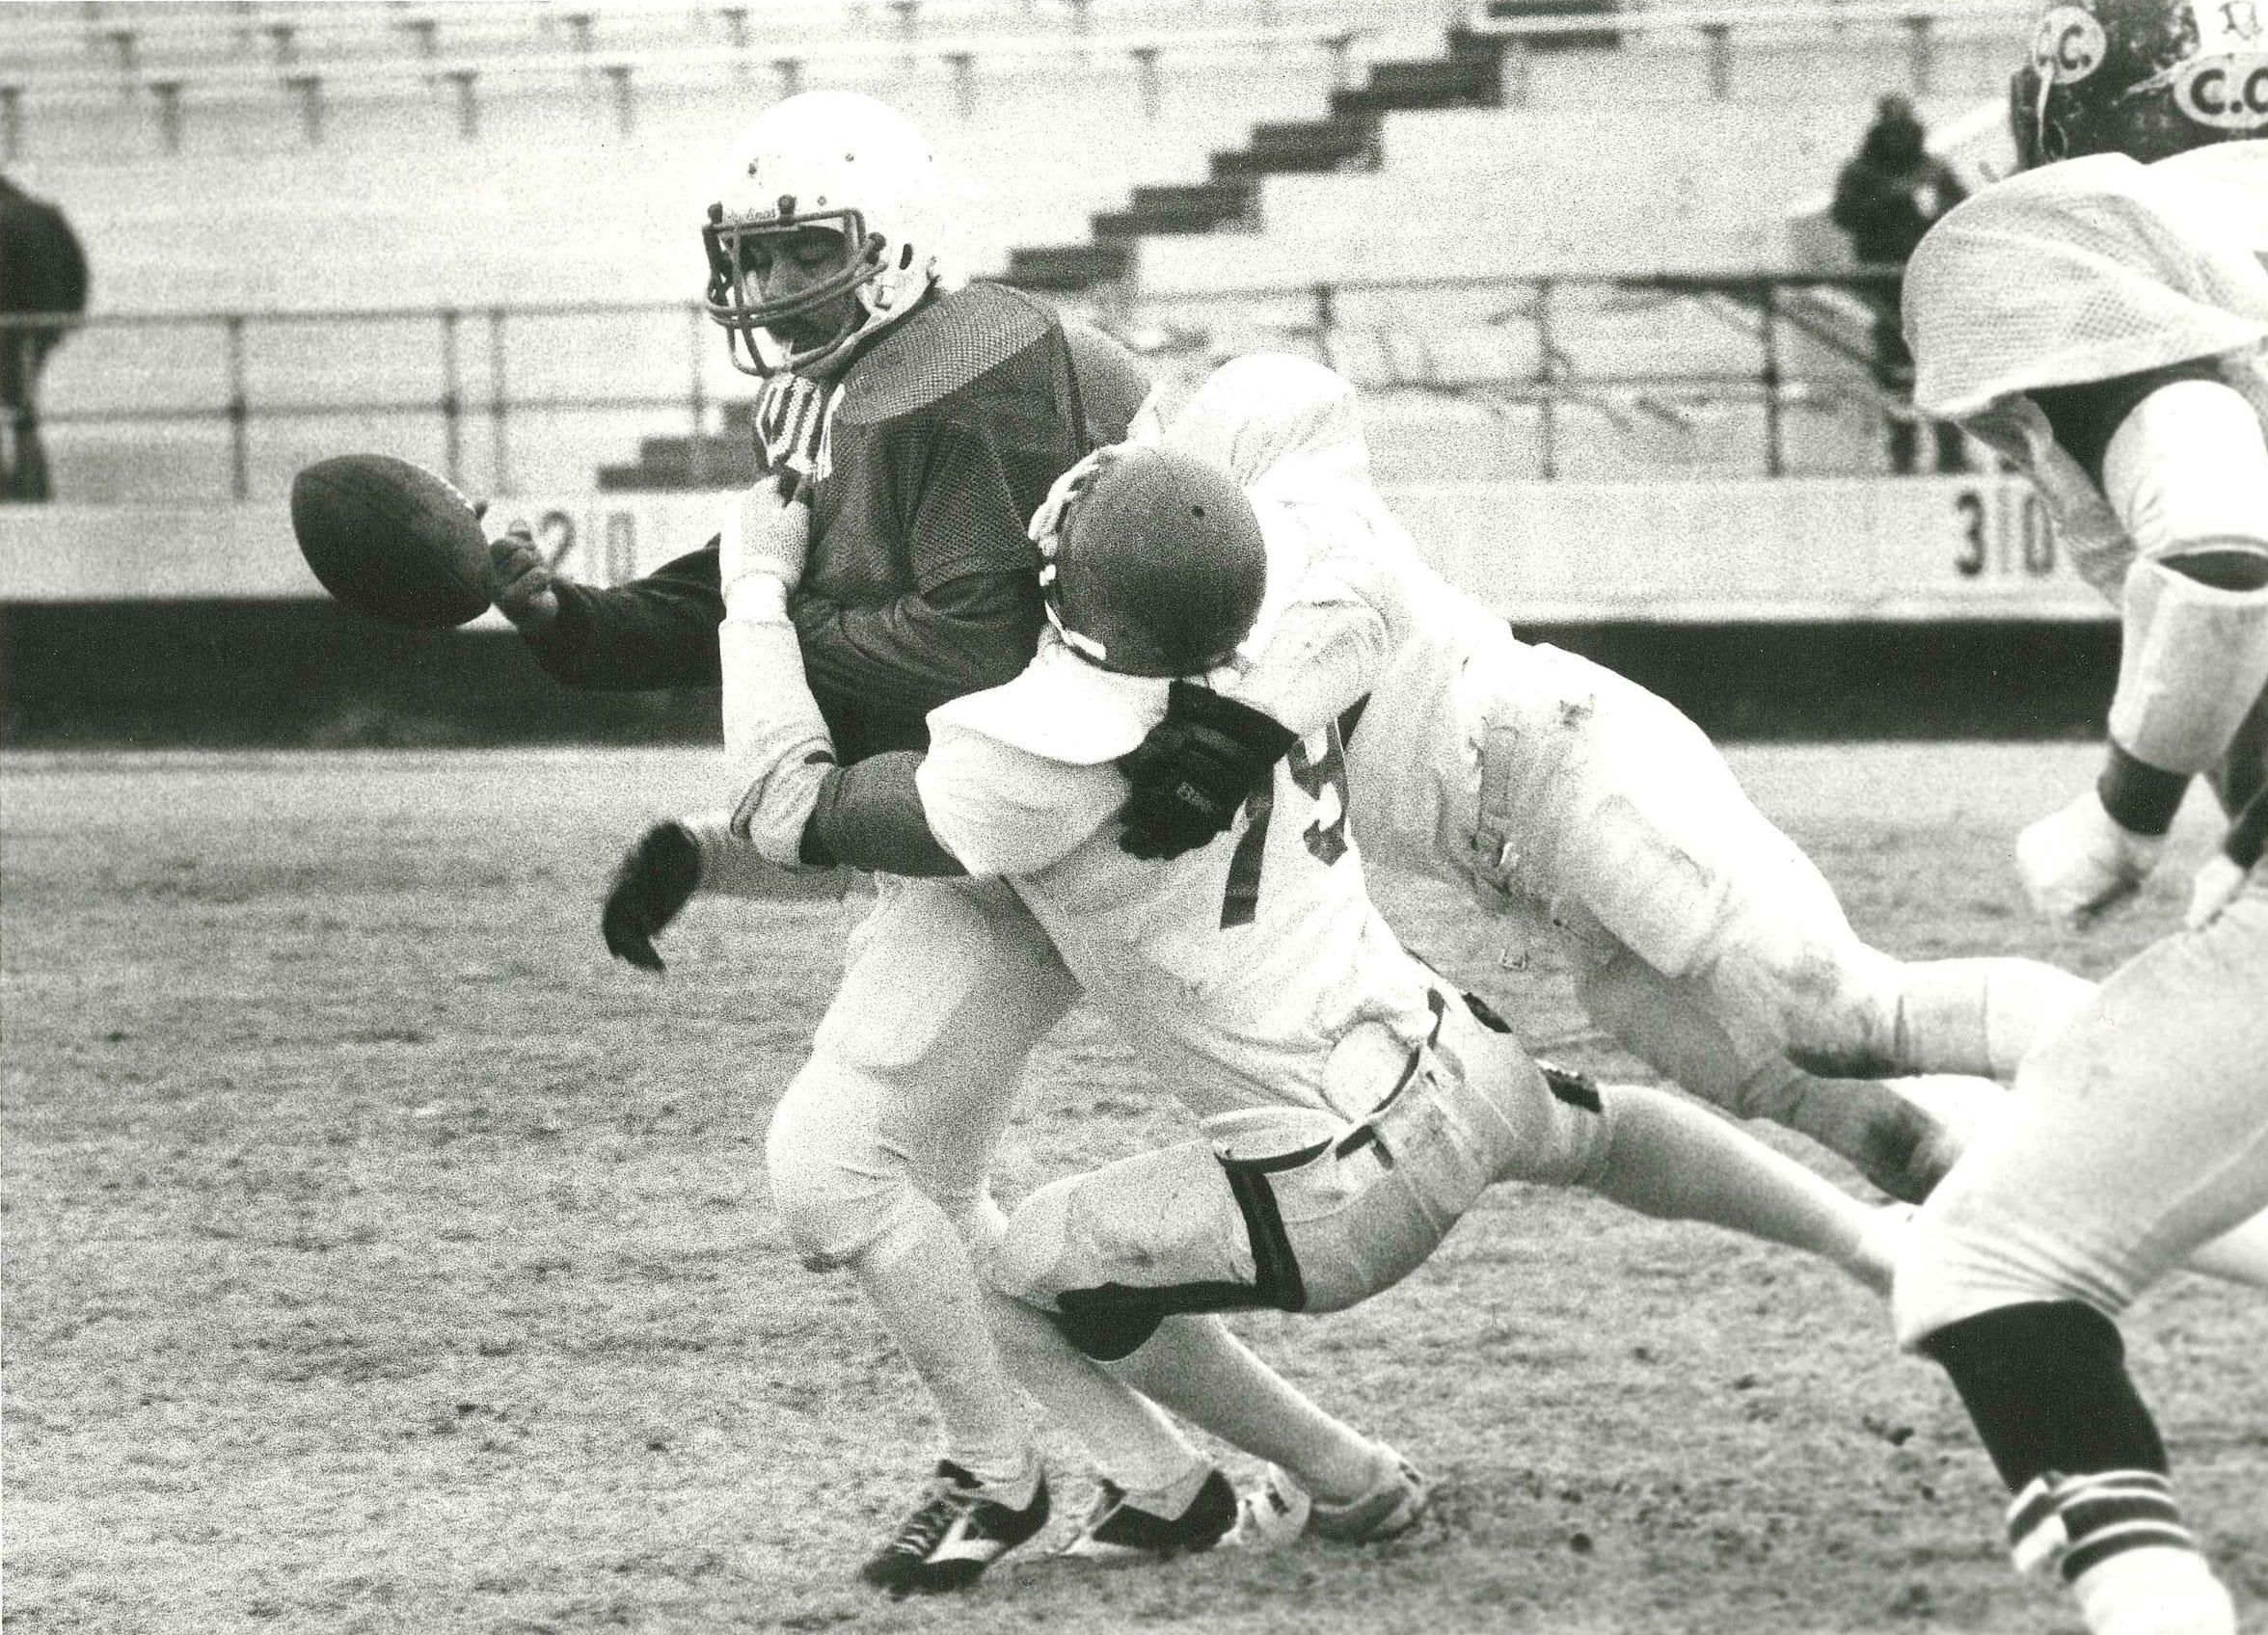 Corpus Christi Army Depot Cobras defenders Herrow Collins (79) and Dan Garcia force LULAC Bronco quarterback Lupe Gutierrez to fumble the ball during the 1984 Menudo Bowl at Buccaneer Stadium.